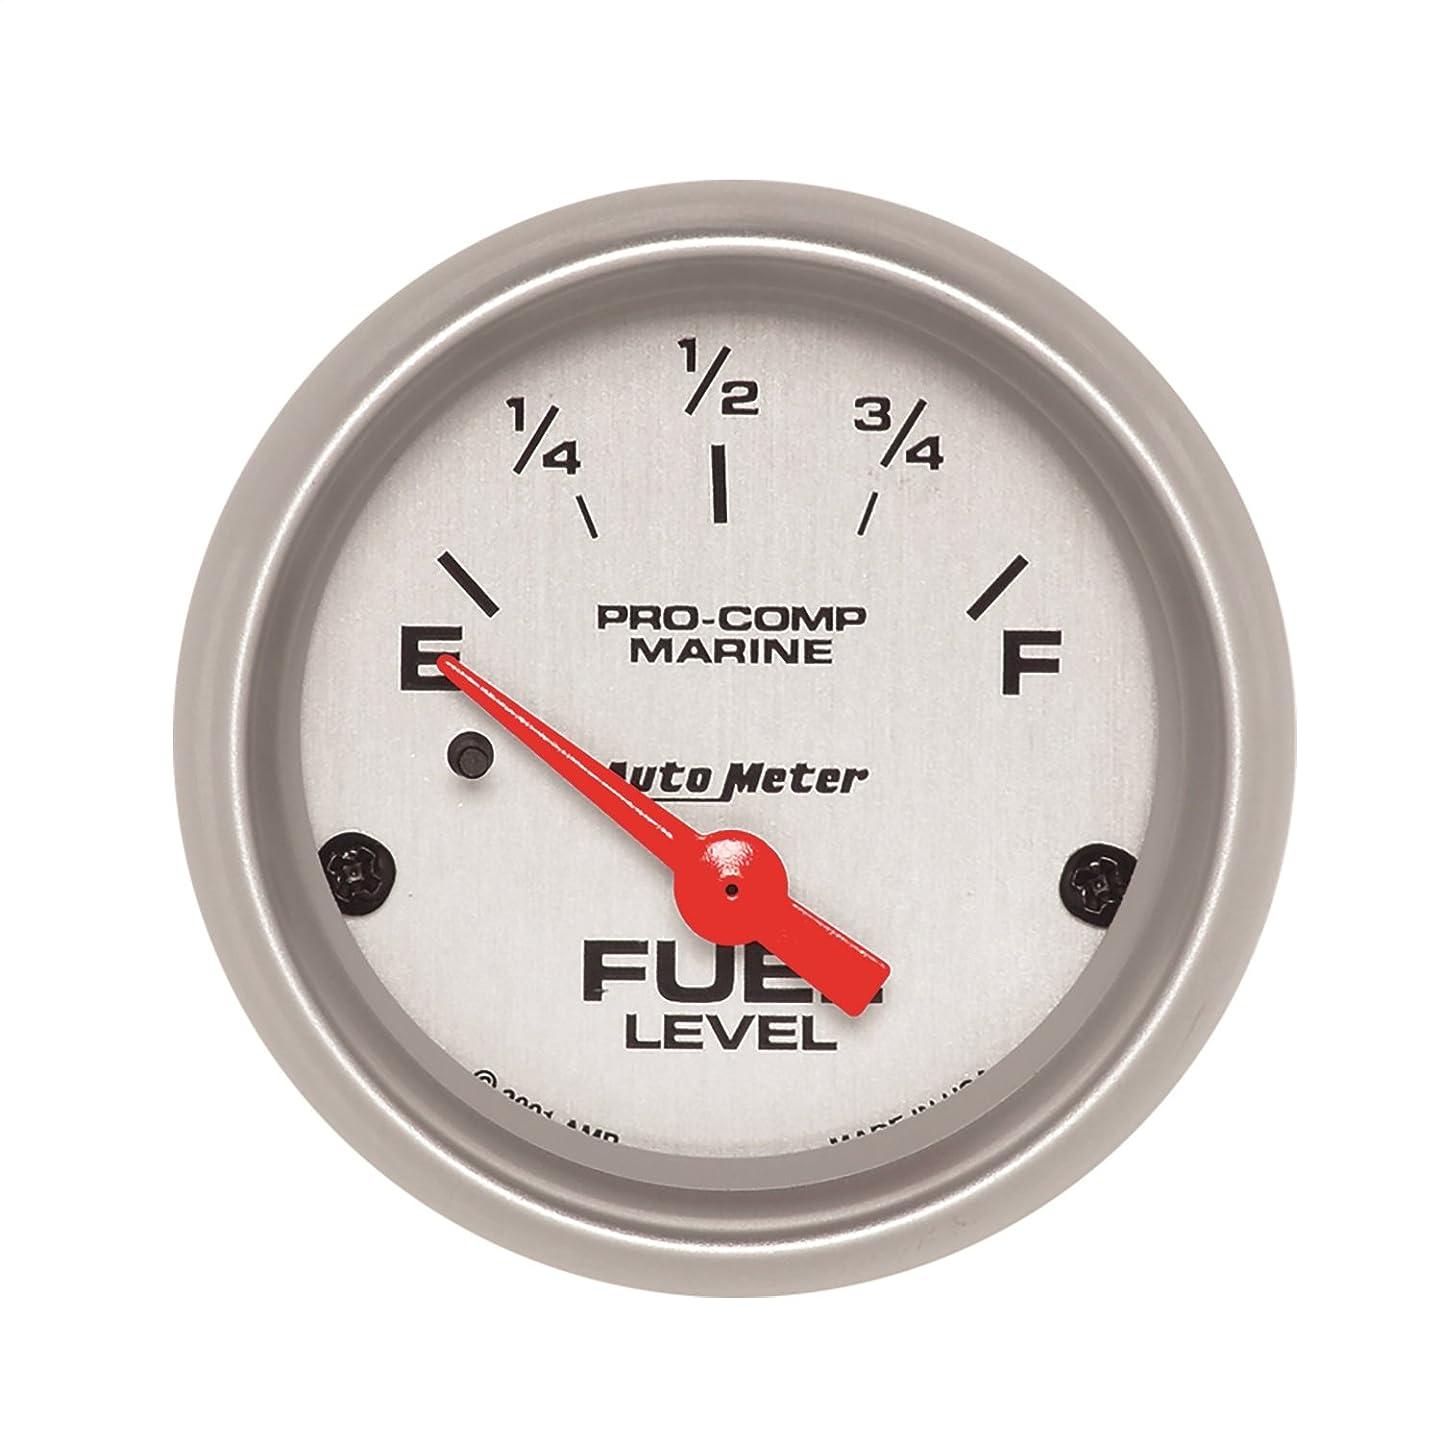 Auto Meter AutoMeter 200760-33 Ultra-Lite Gauge, Fuel Level, 2 1/16